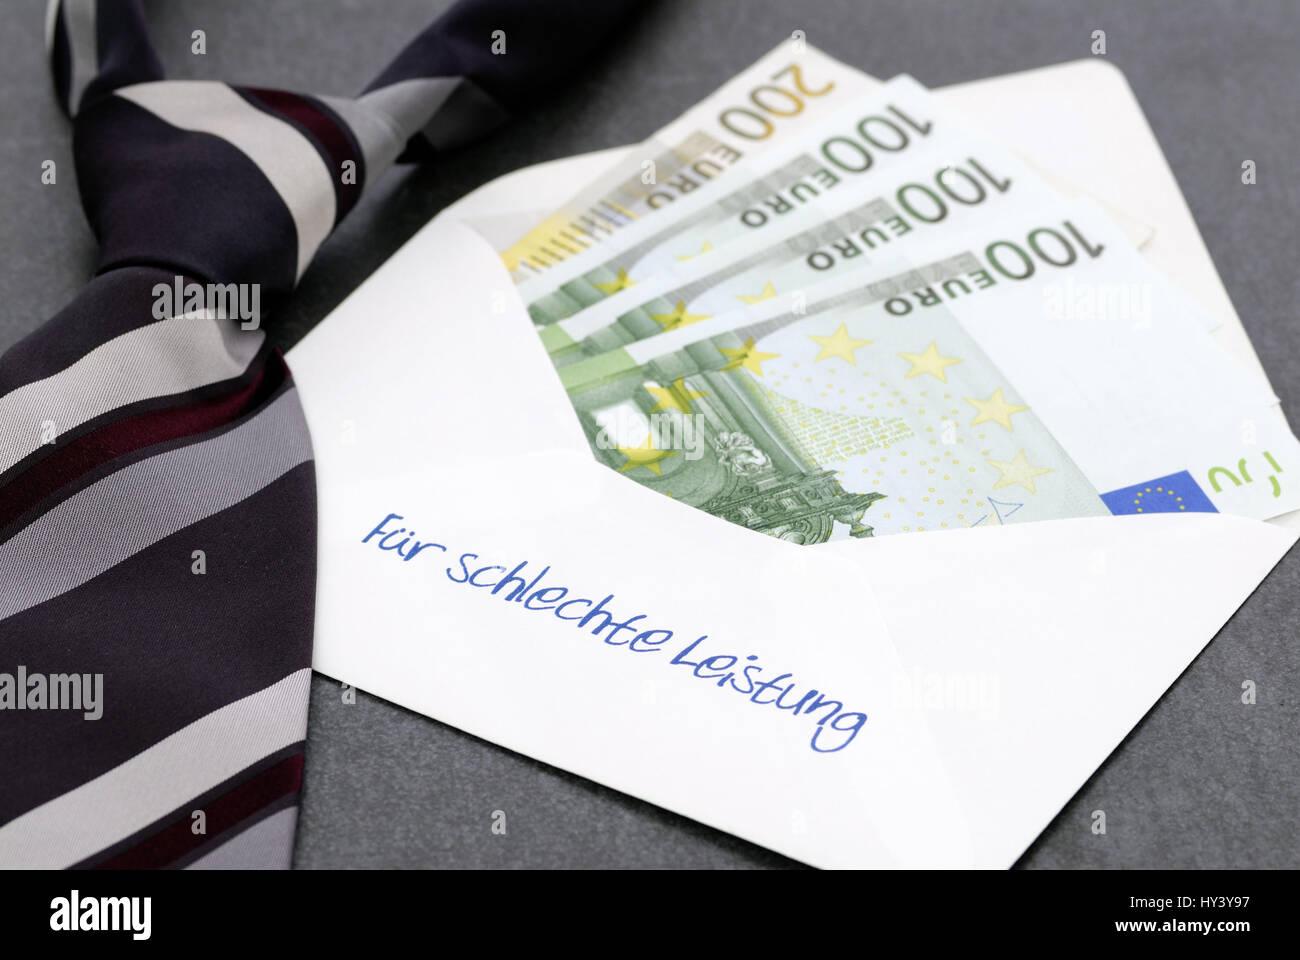 For bad achievement, envelope with label and bank notes, banker's bonus, Fuer schlechte Leistung, Briefumschlag - Stock Image